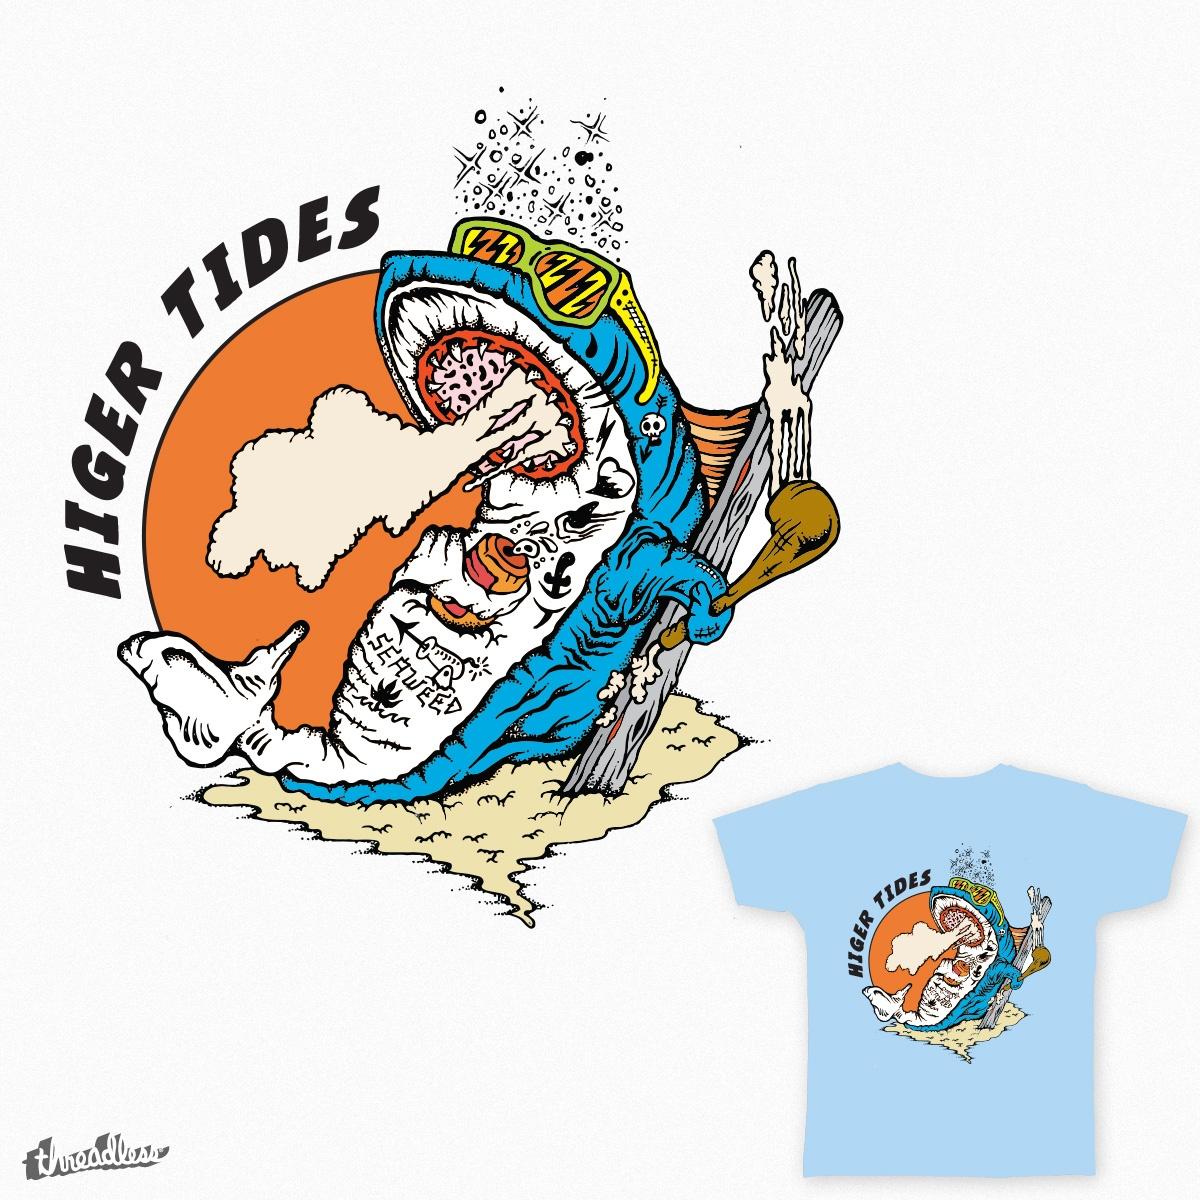 Higher Tides by conrad.m.dahl on Threadless